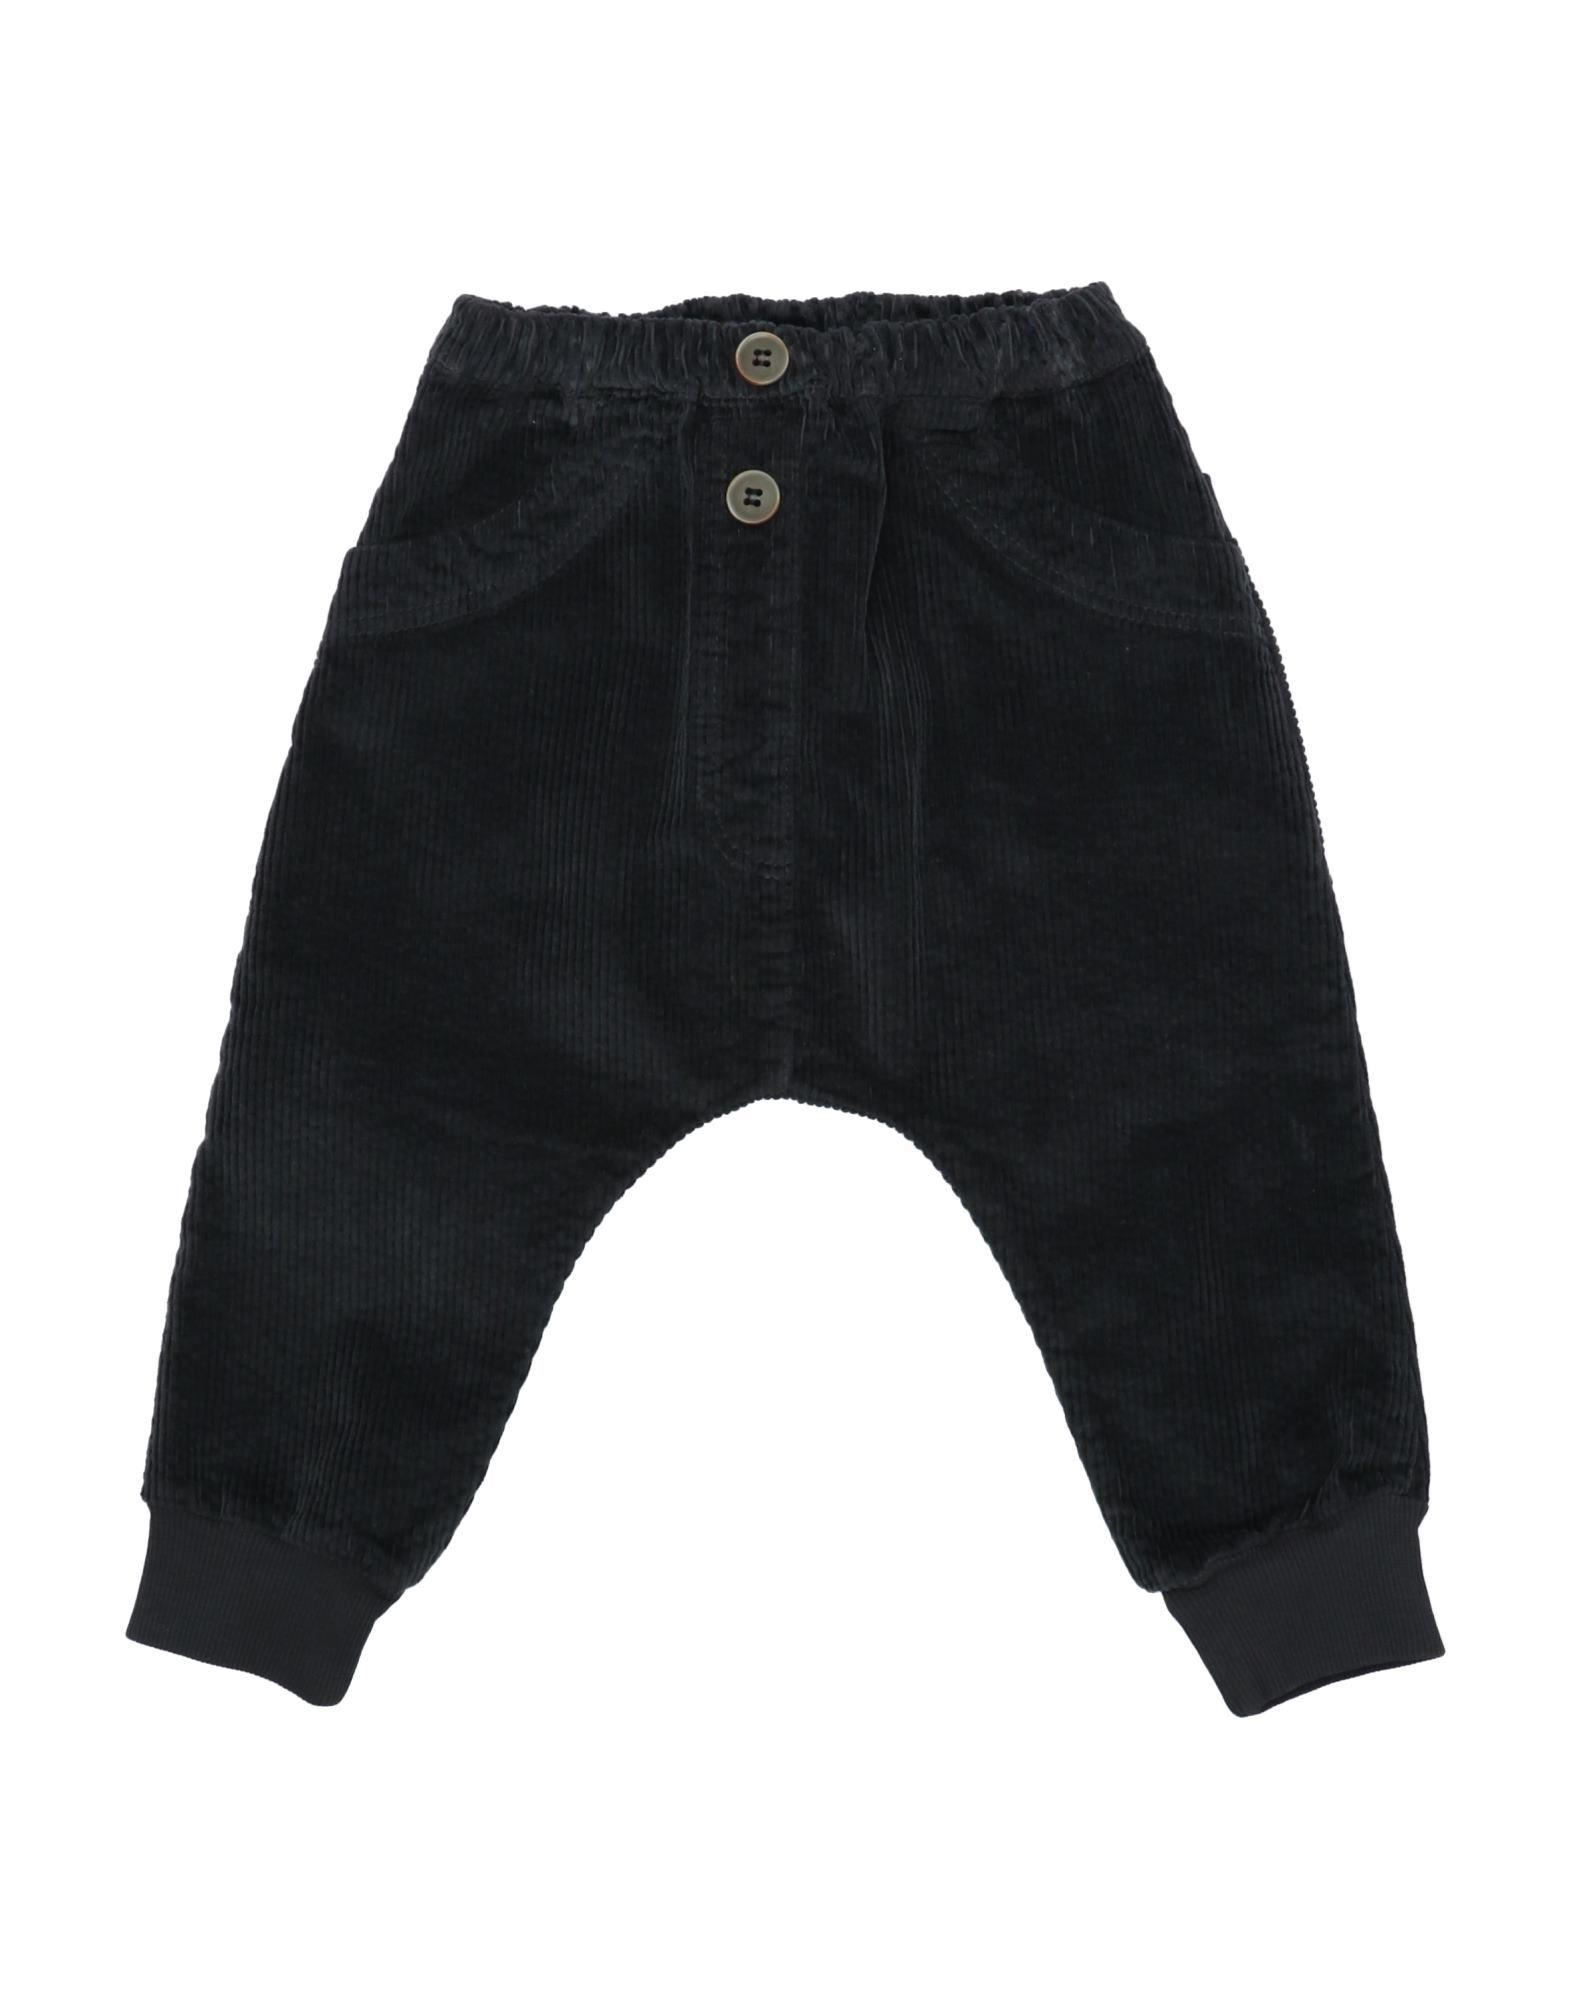 1 + IN THE FAMILY Повседневные брюки nocturne 22 in c sharp minor op posth повседневные брюки